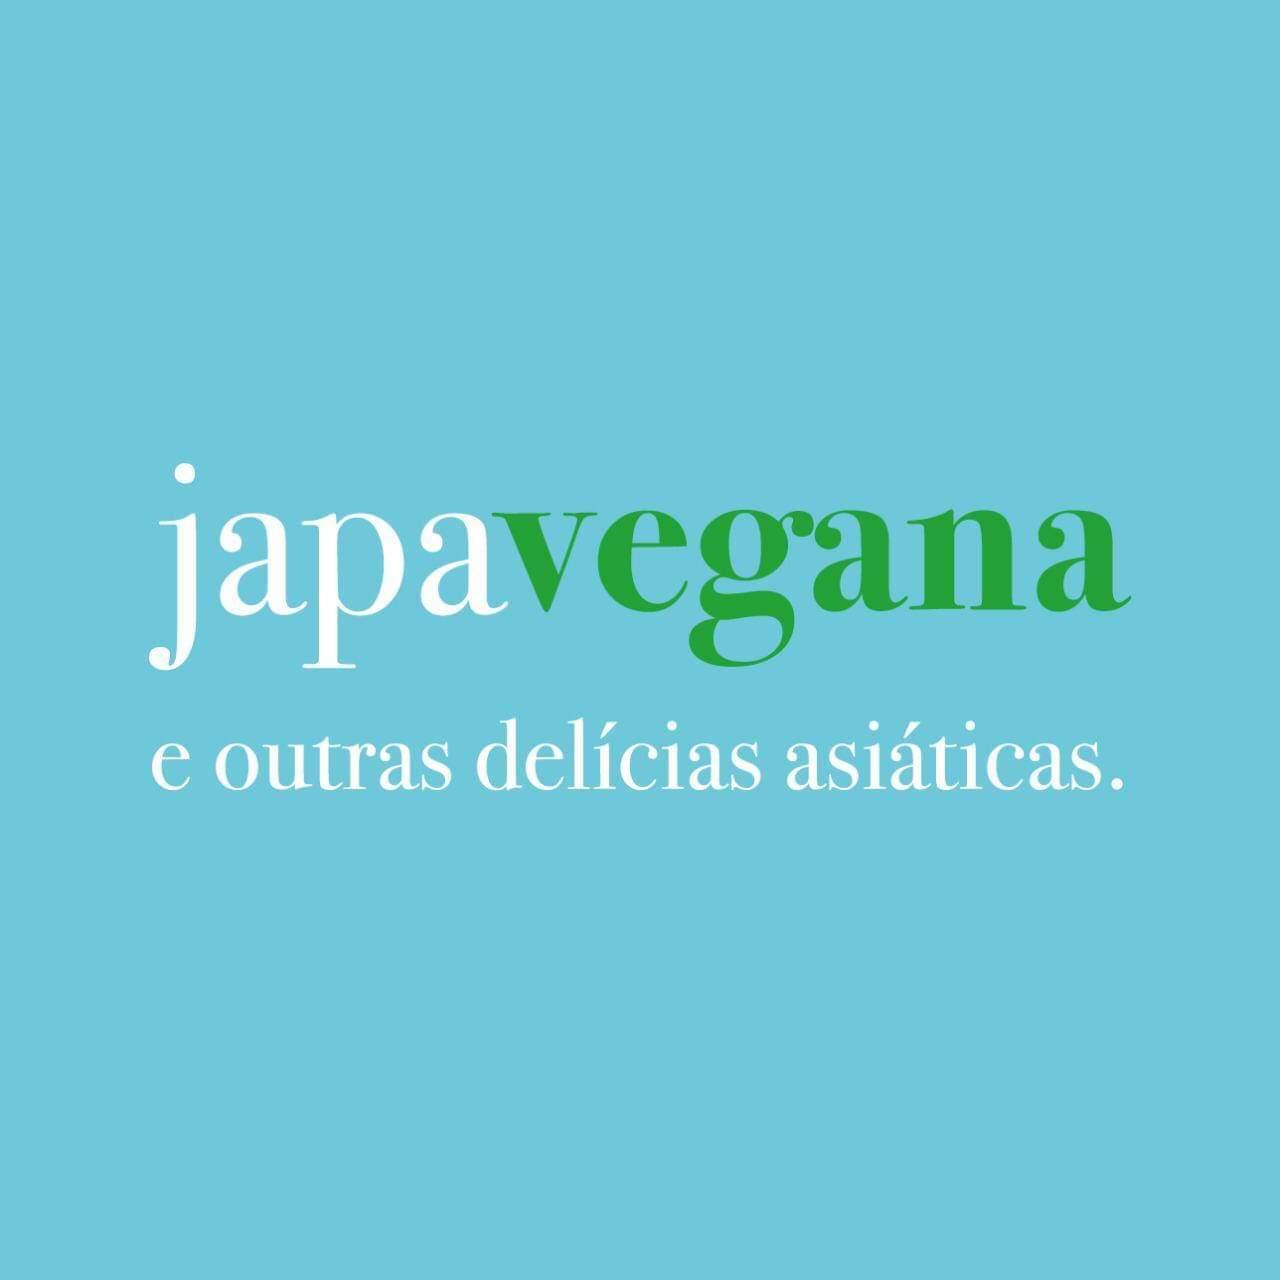 TRANSEMPREGOS DIVULGA: Vaga para Sushiwoman / Sushiman em SÃO PAULO - INICIO IMEDIATO